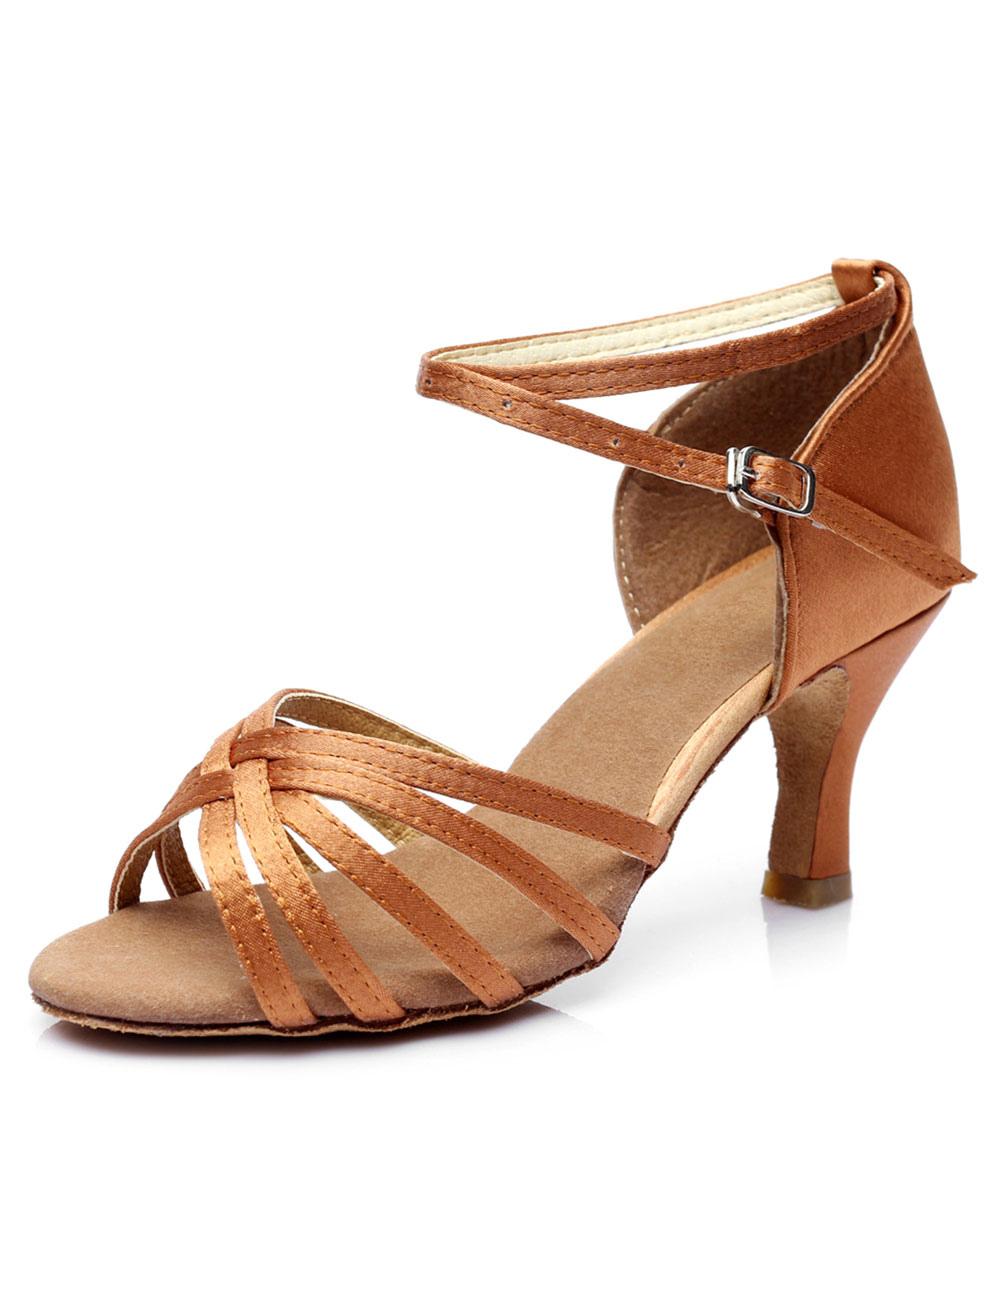 13808fd595 Sapatos Latinos atacado Sapatos Latinos Online   Milanoo.com